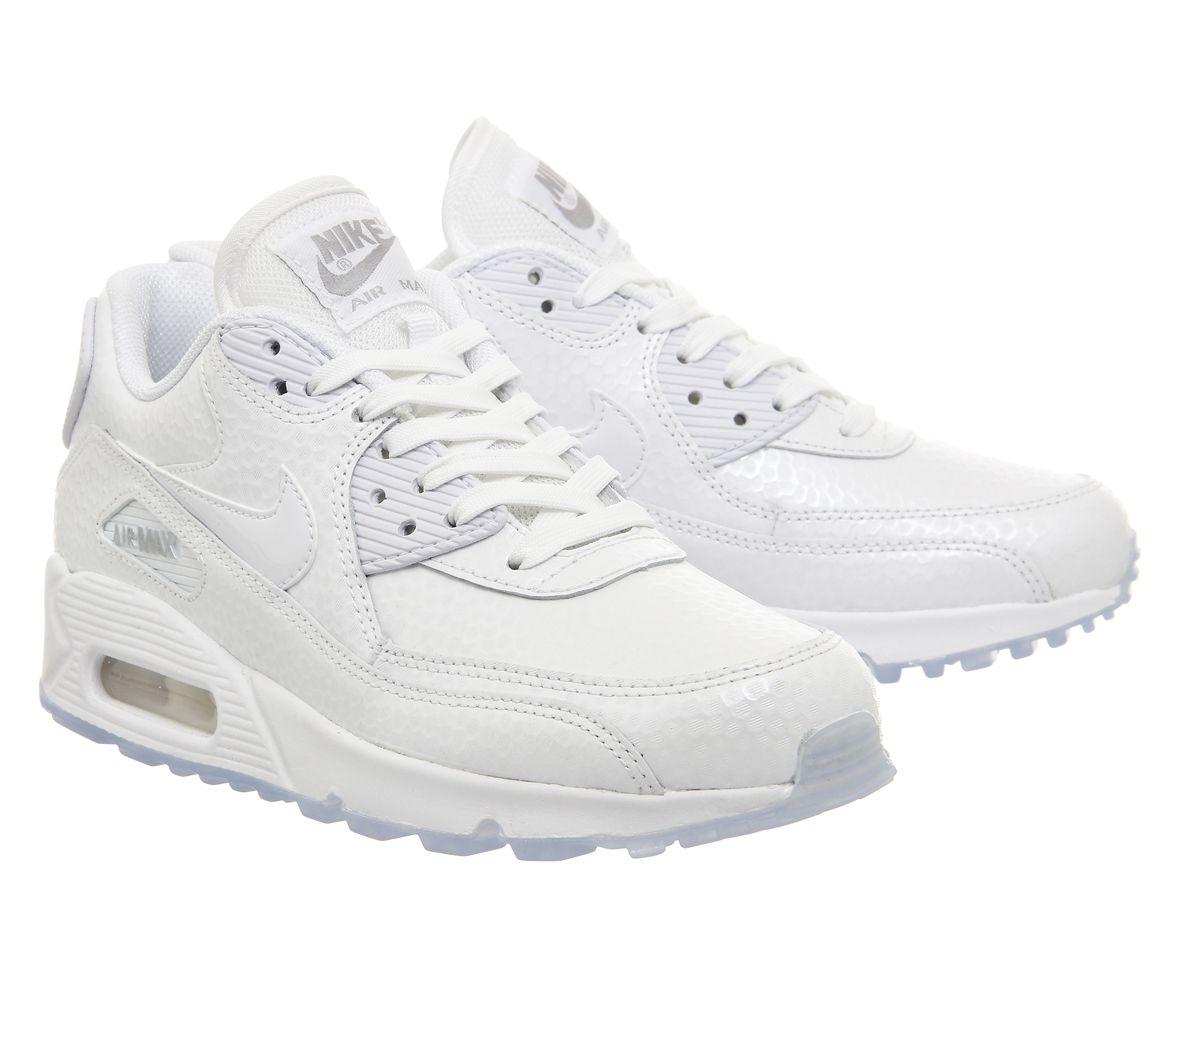 Nike Air Max 90 Pearl Pack (w) White Metallic Silver Hers